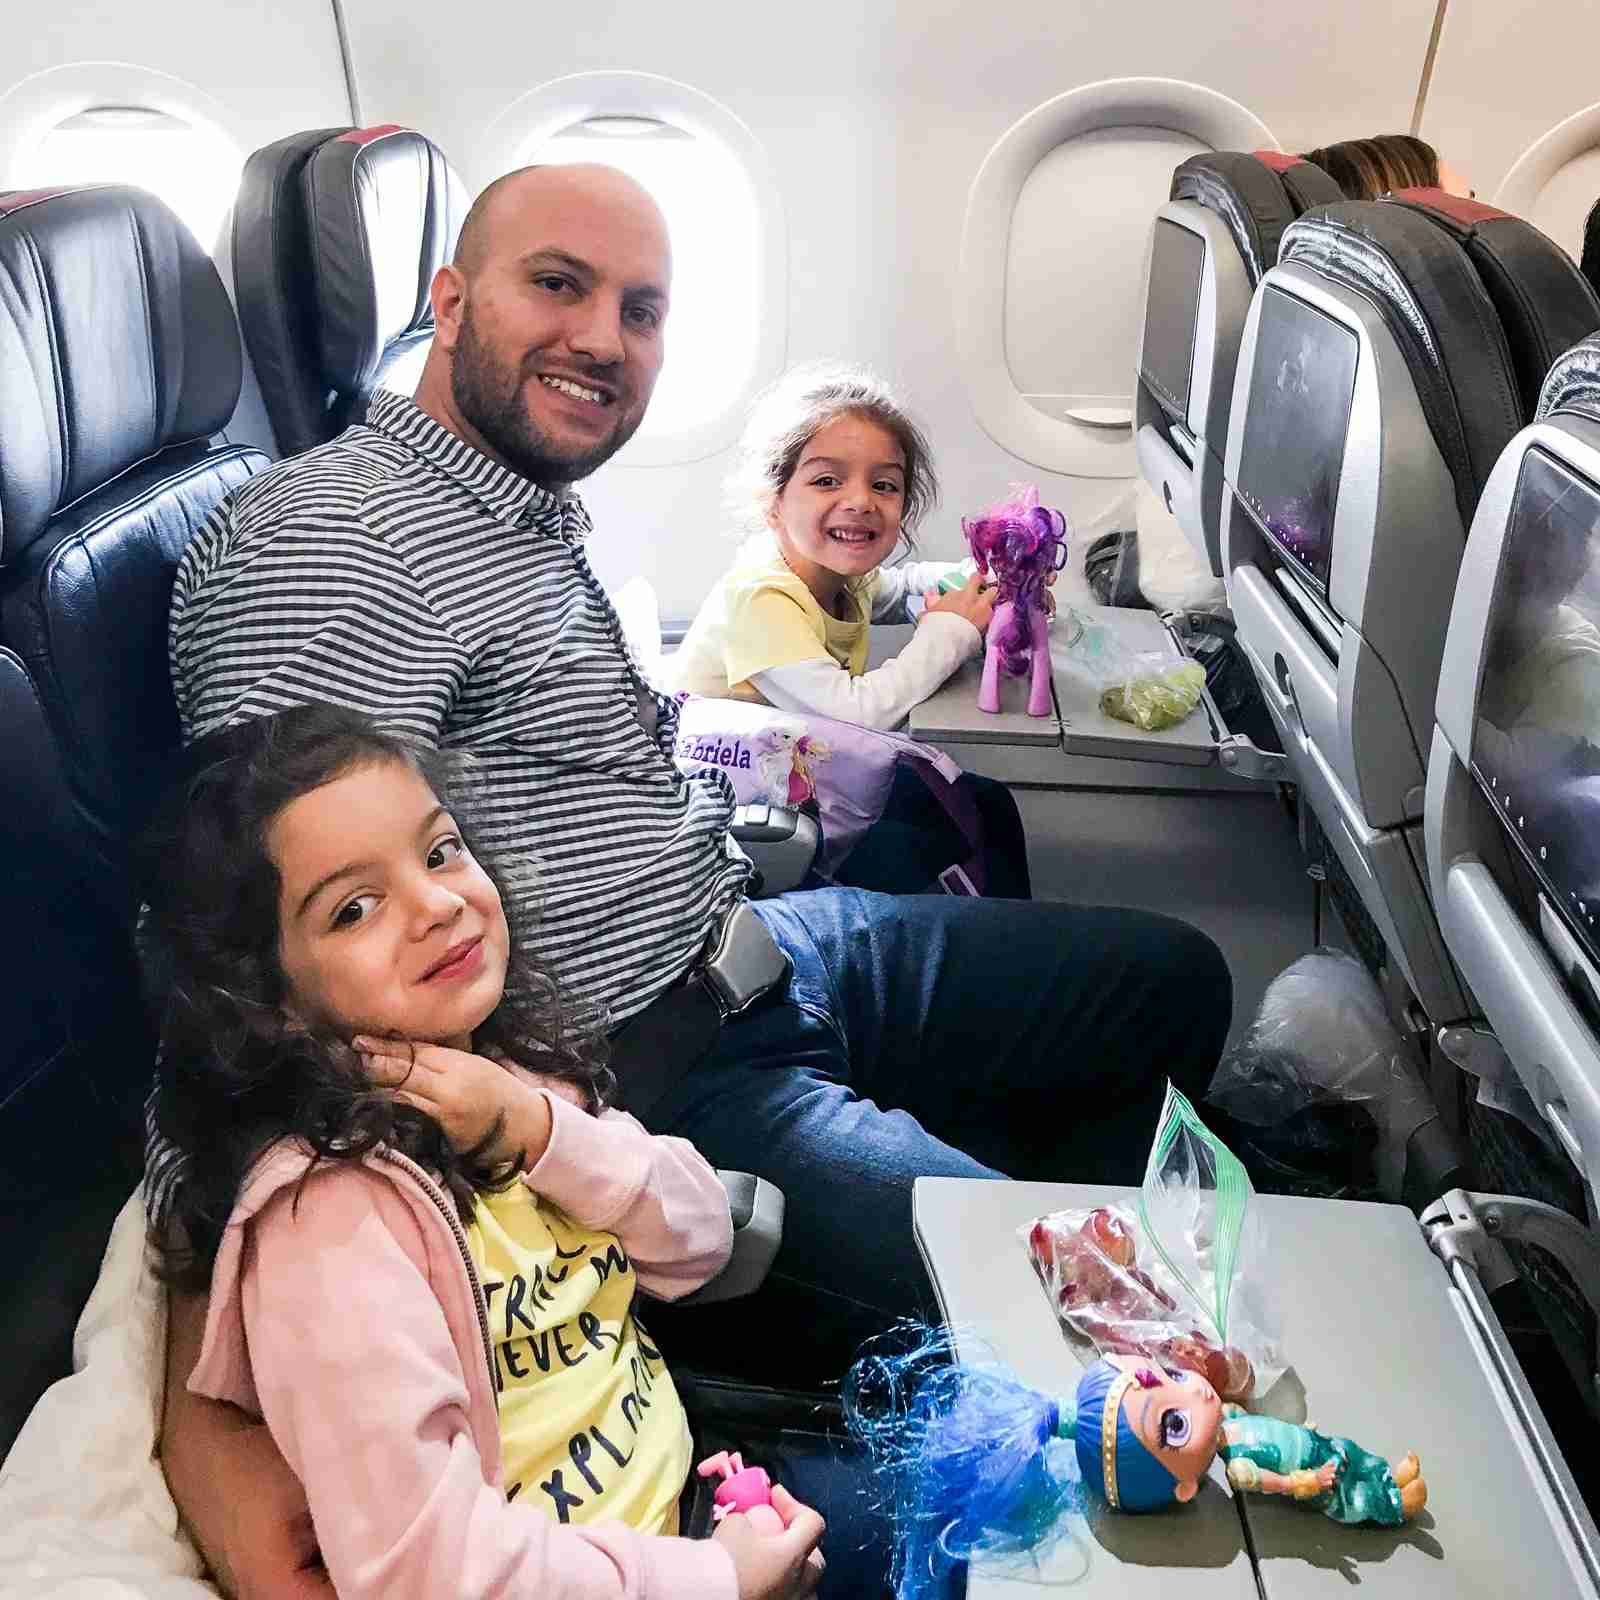 TPG contributor Juan Ruiz with his traveling twins. (Photo courtesy of Juan Ruiz)